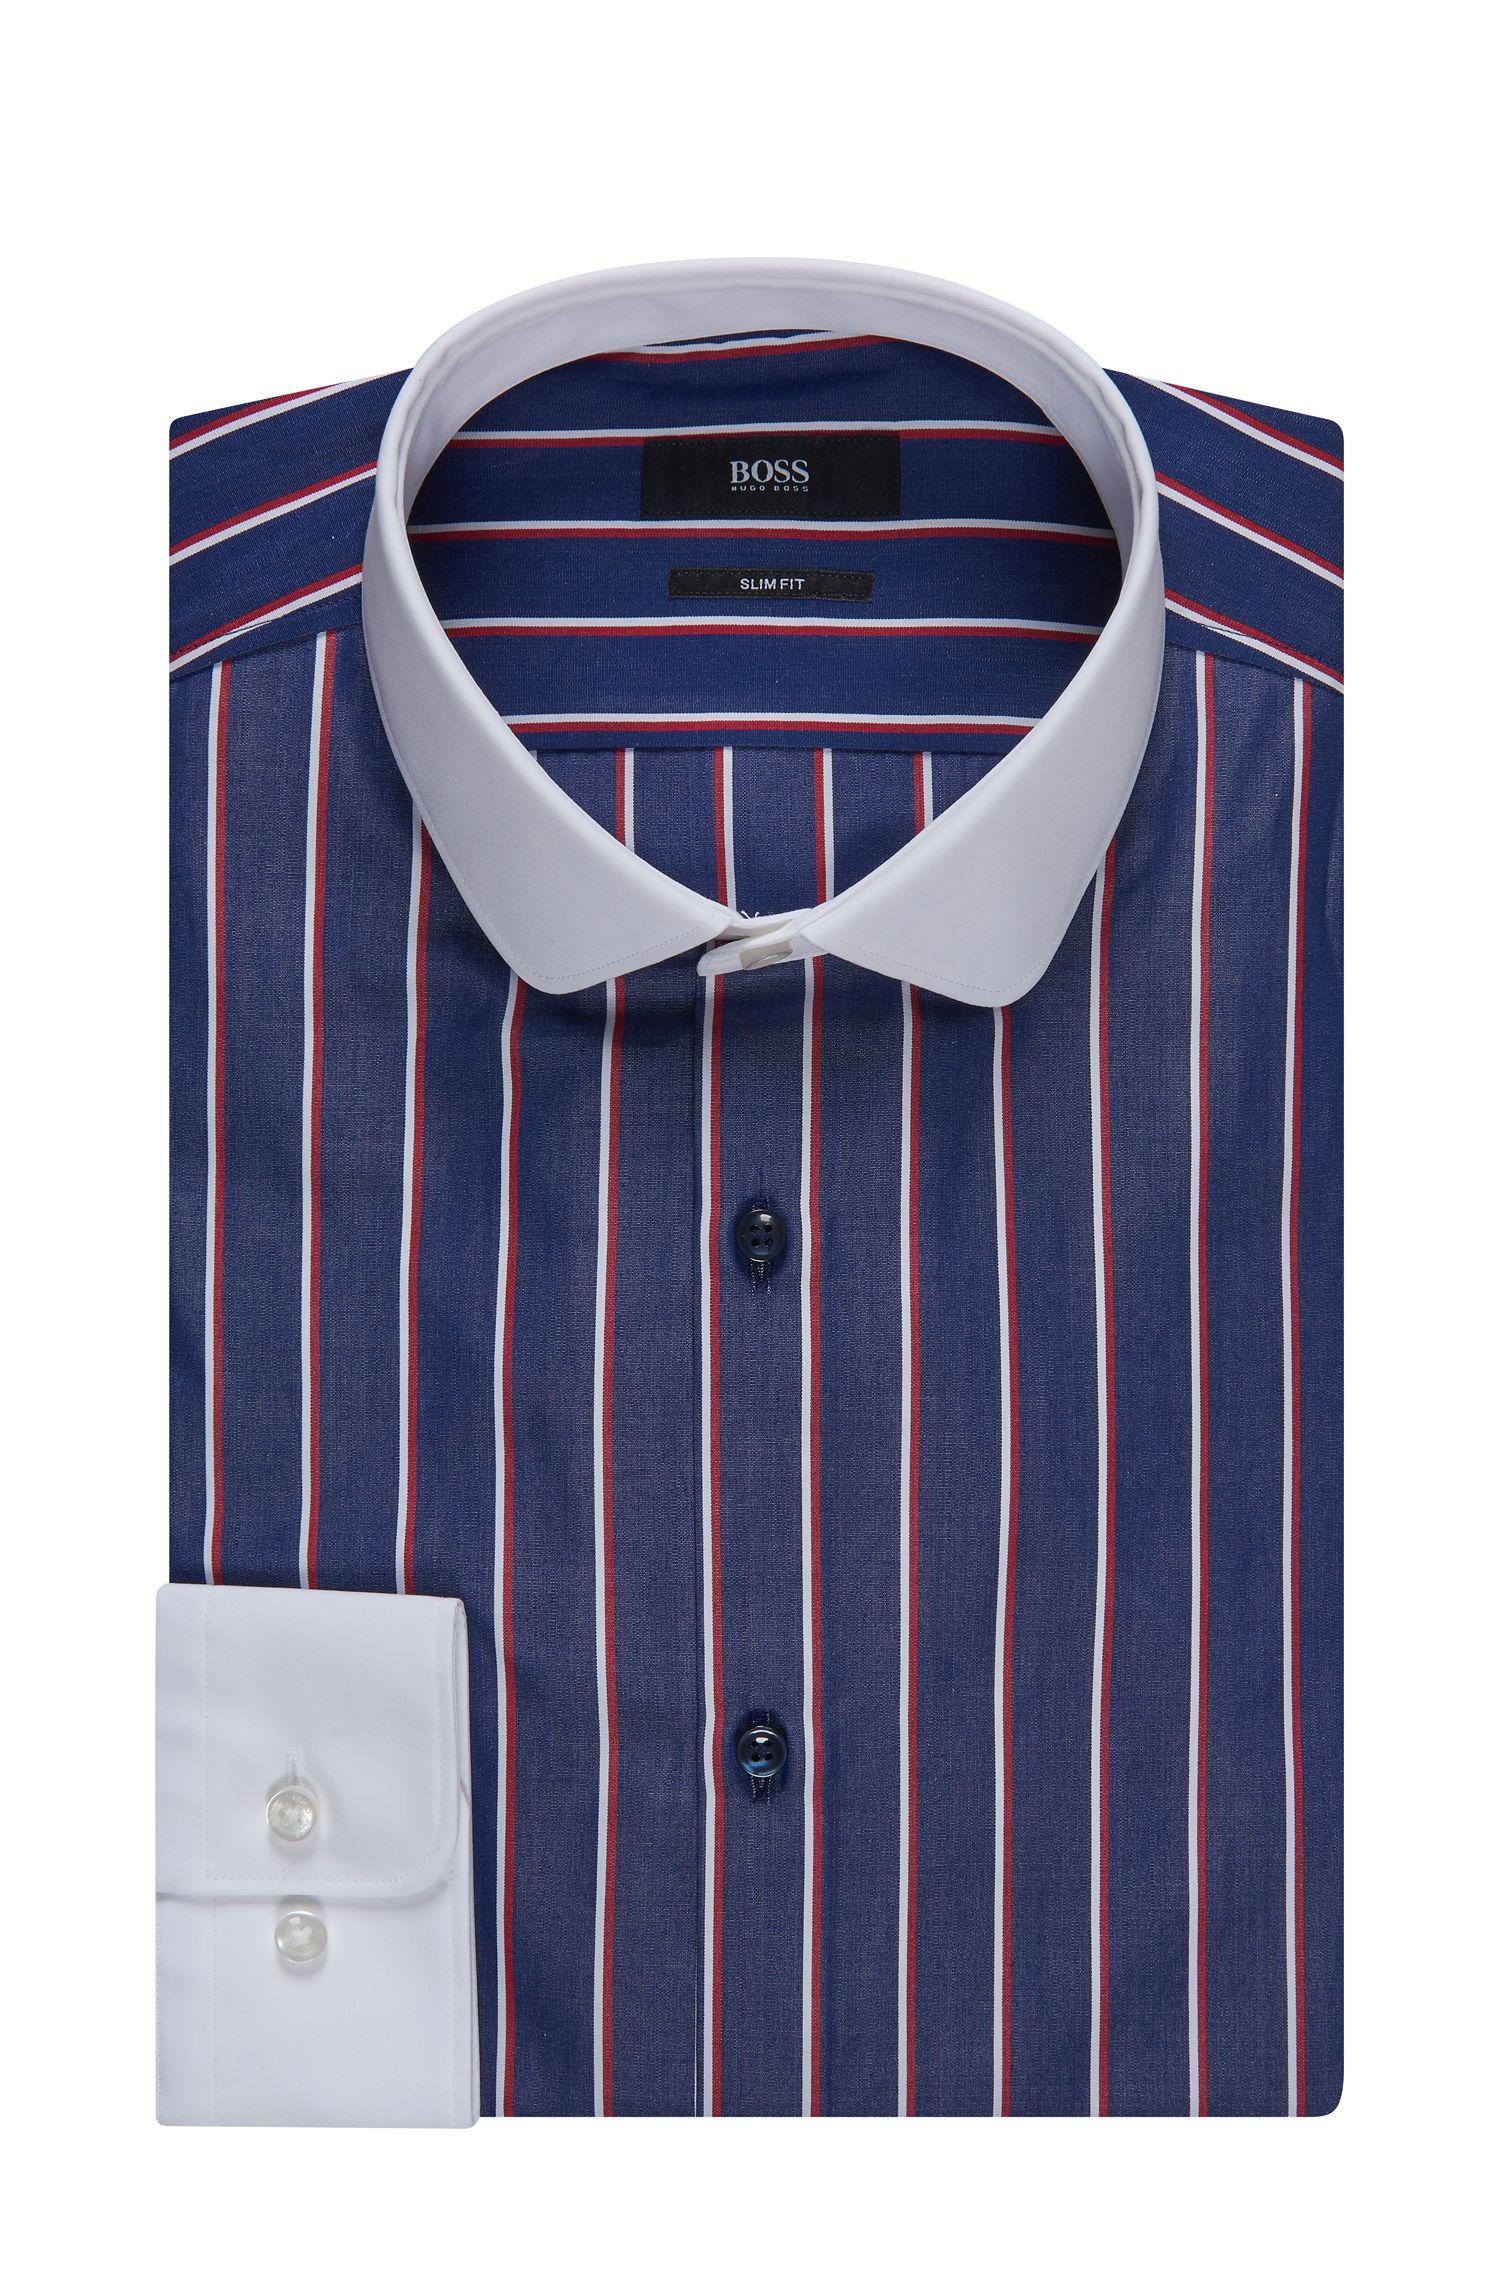 Contrast Easy Iron Cotton Dress Shirt, Slim Fit | Joshy